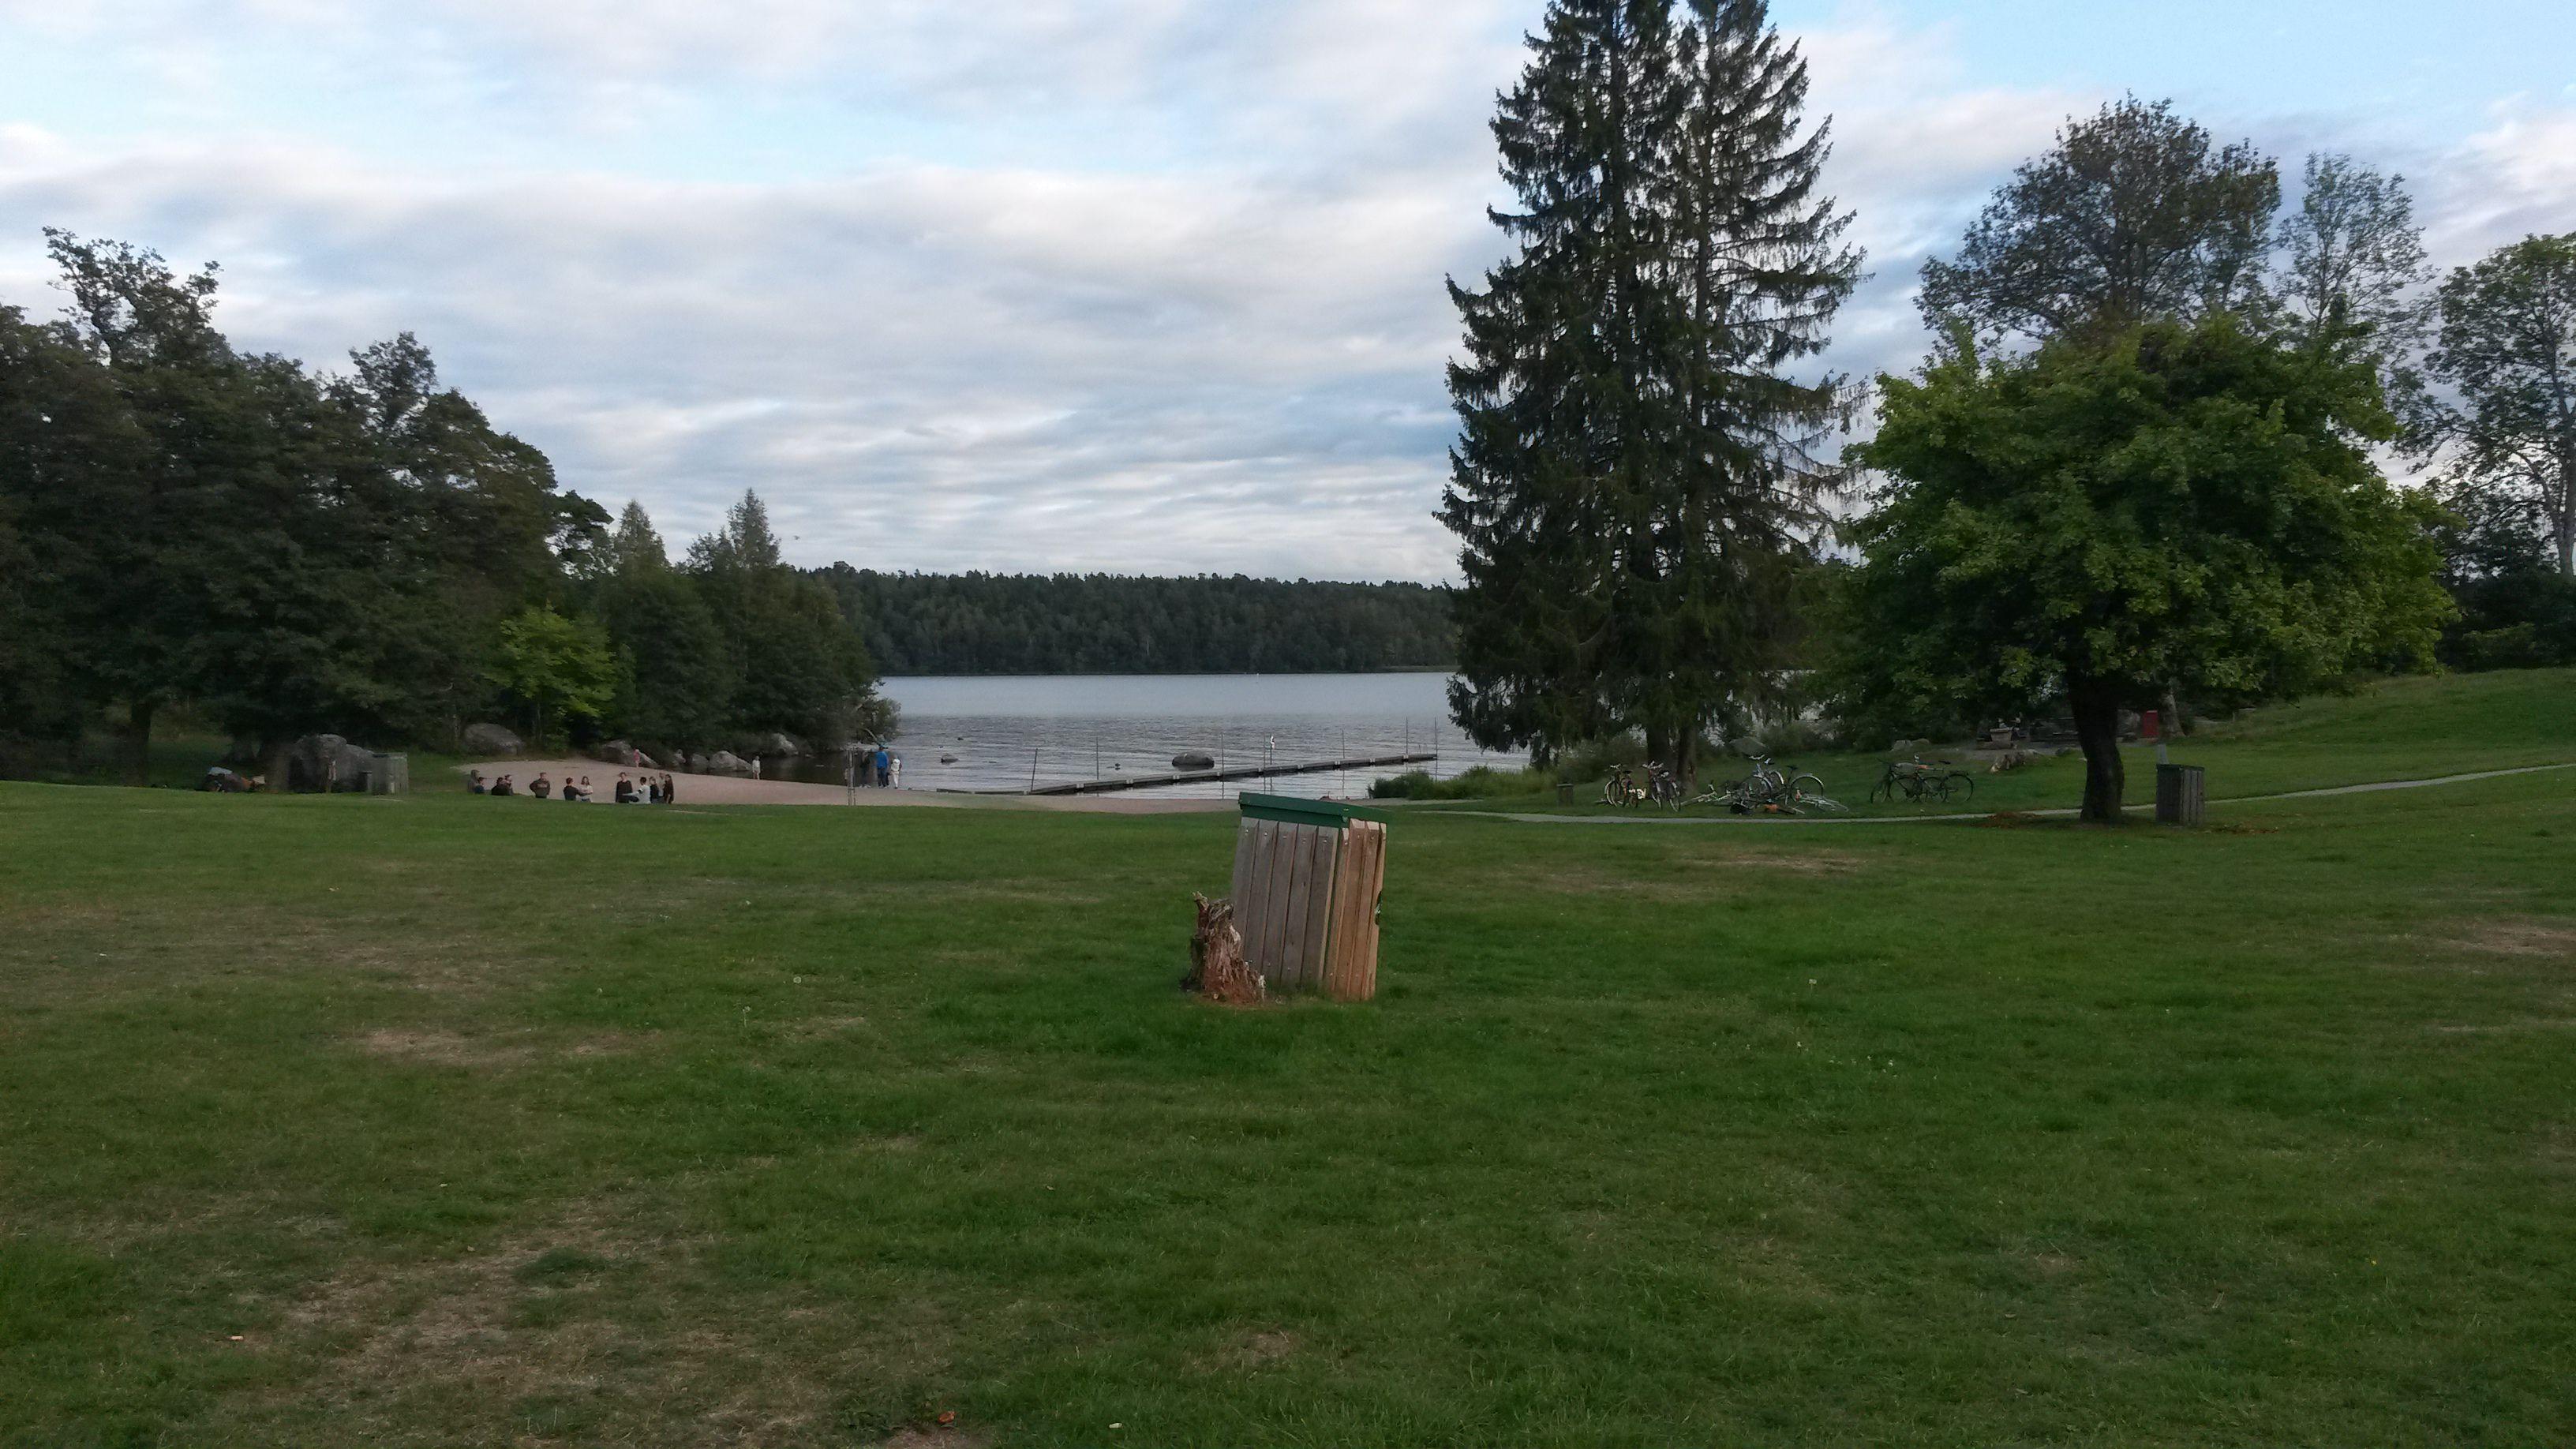 Ekoln Gölü, Sunnersta, Uppsala